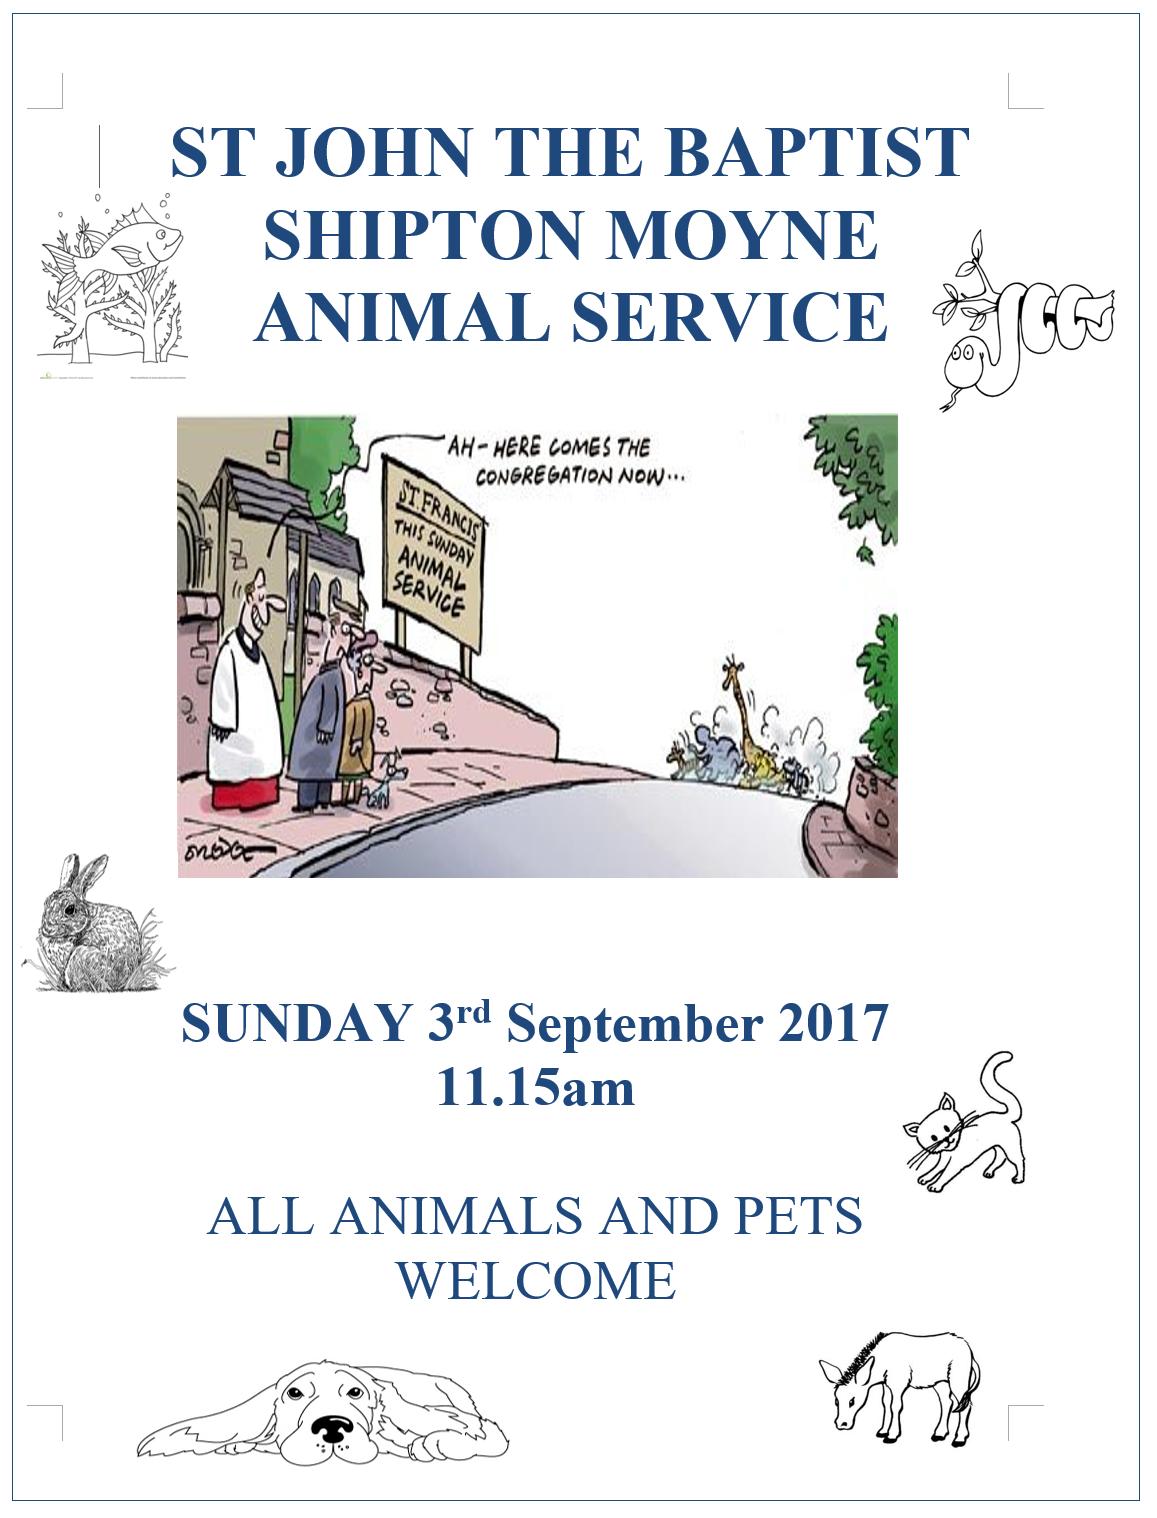 Animal Service at Shipton Moyne. Sunday Sept 3rd. 11:15 am